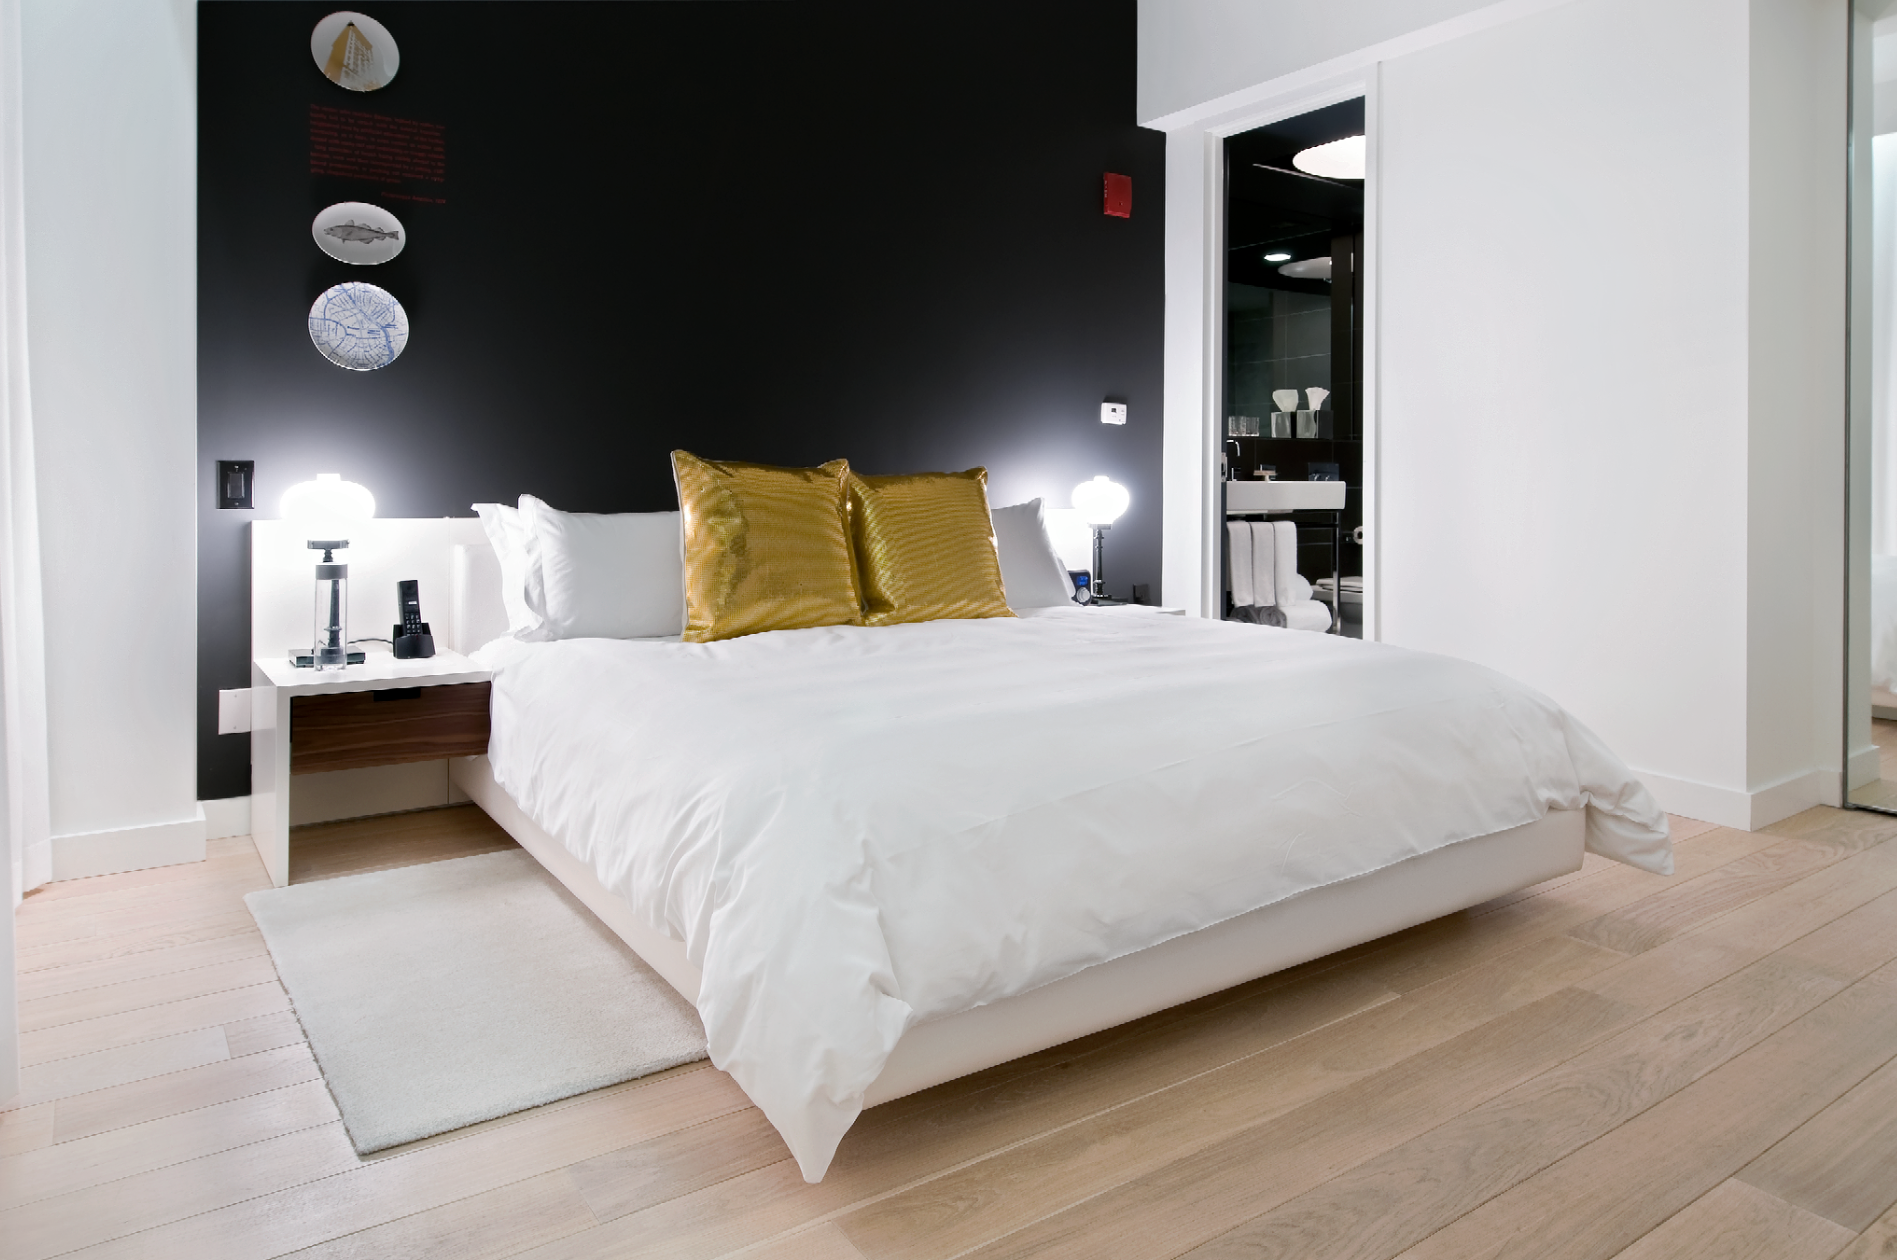 Bedroom Flooring From Siberian Floors